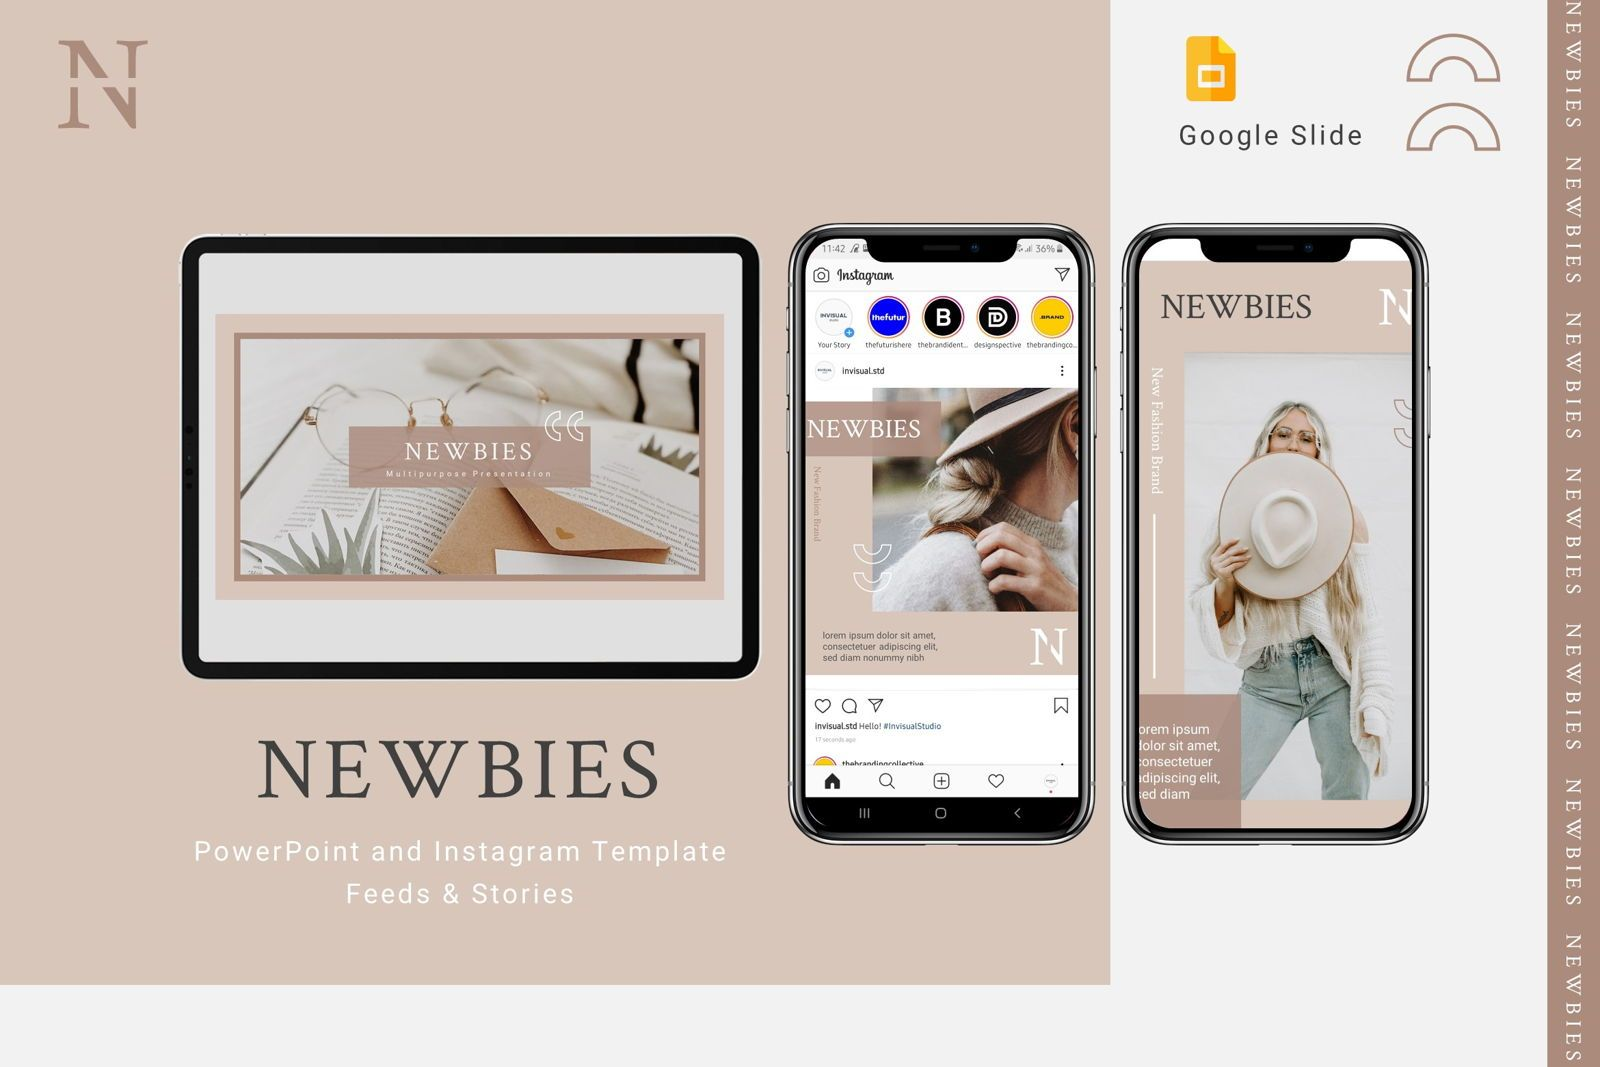 Newbies - Google Slides Template, 08027, Presentation Templates — PoweredTemplate.com